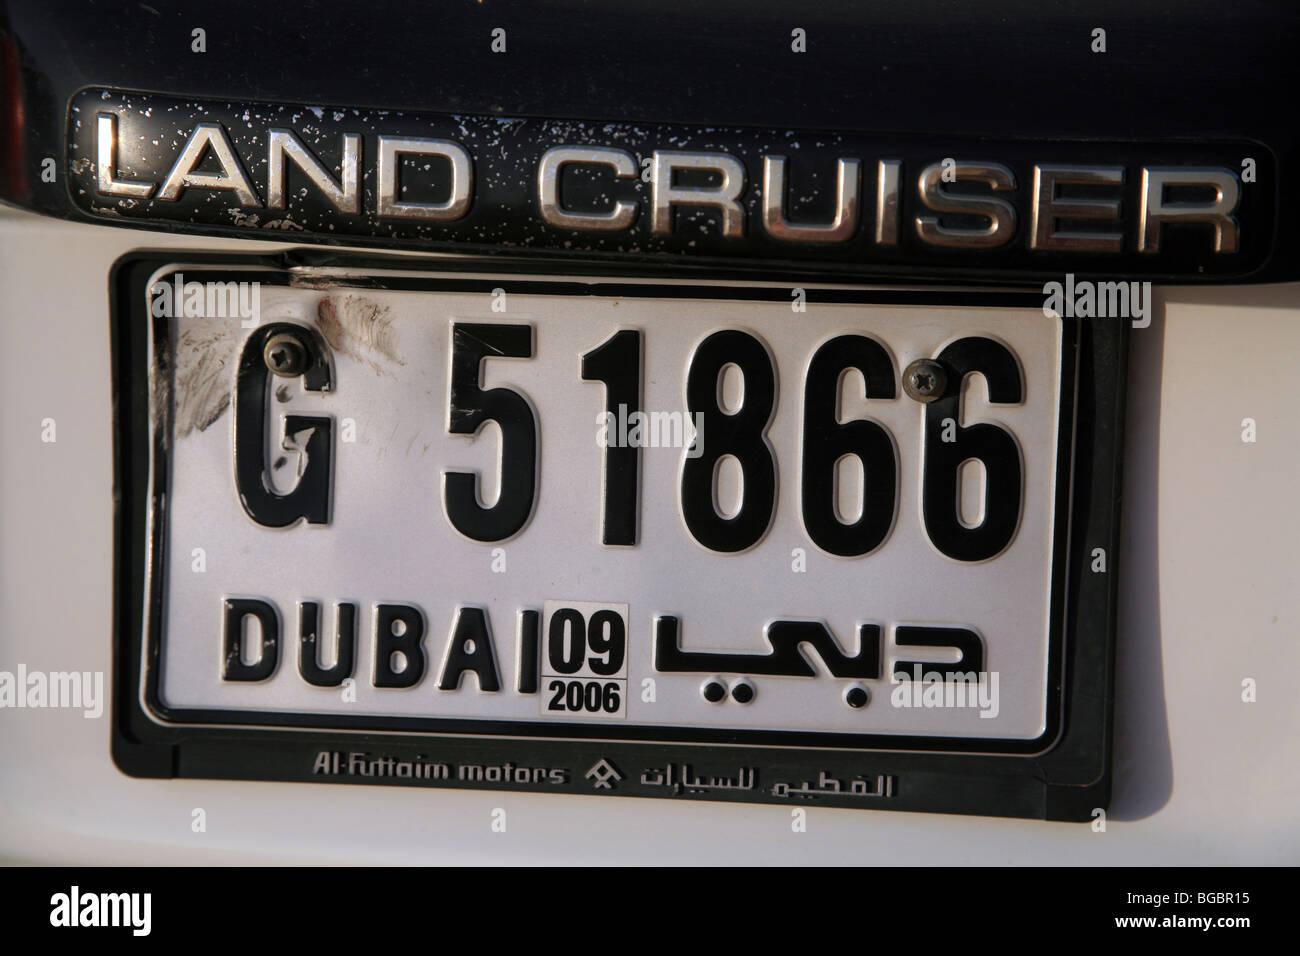 Number Plate Of A Land Cruiser Dubai Stock Photo 27304401